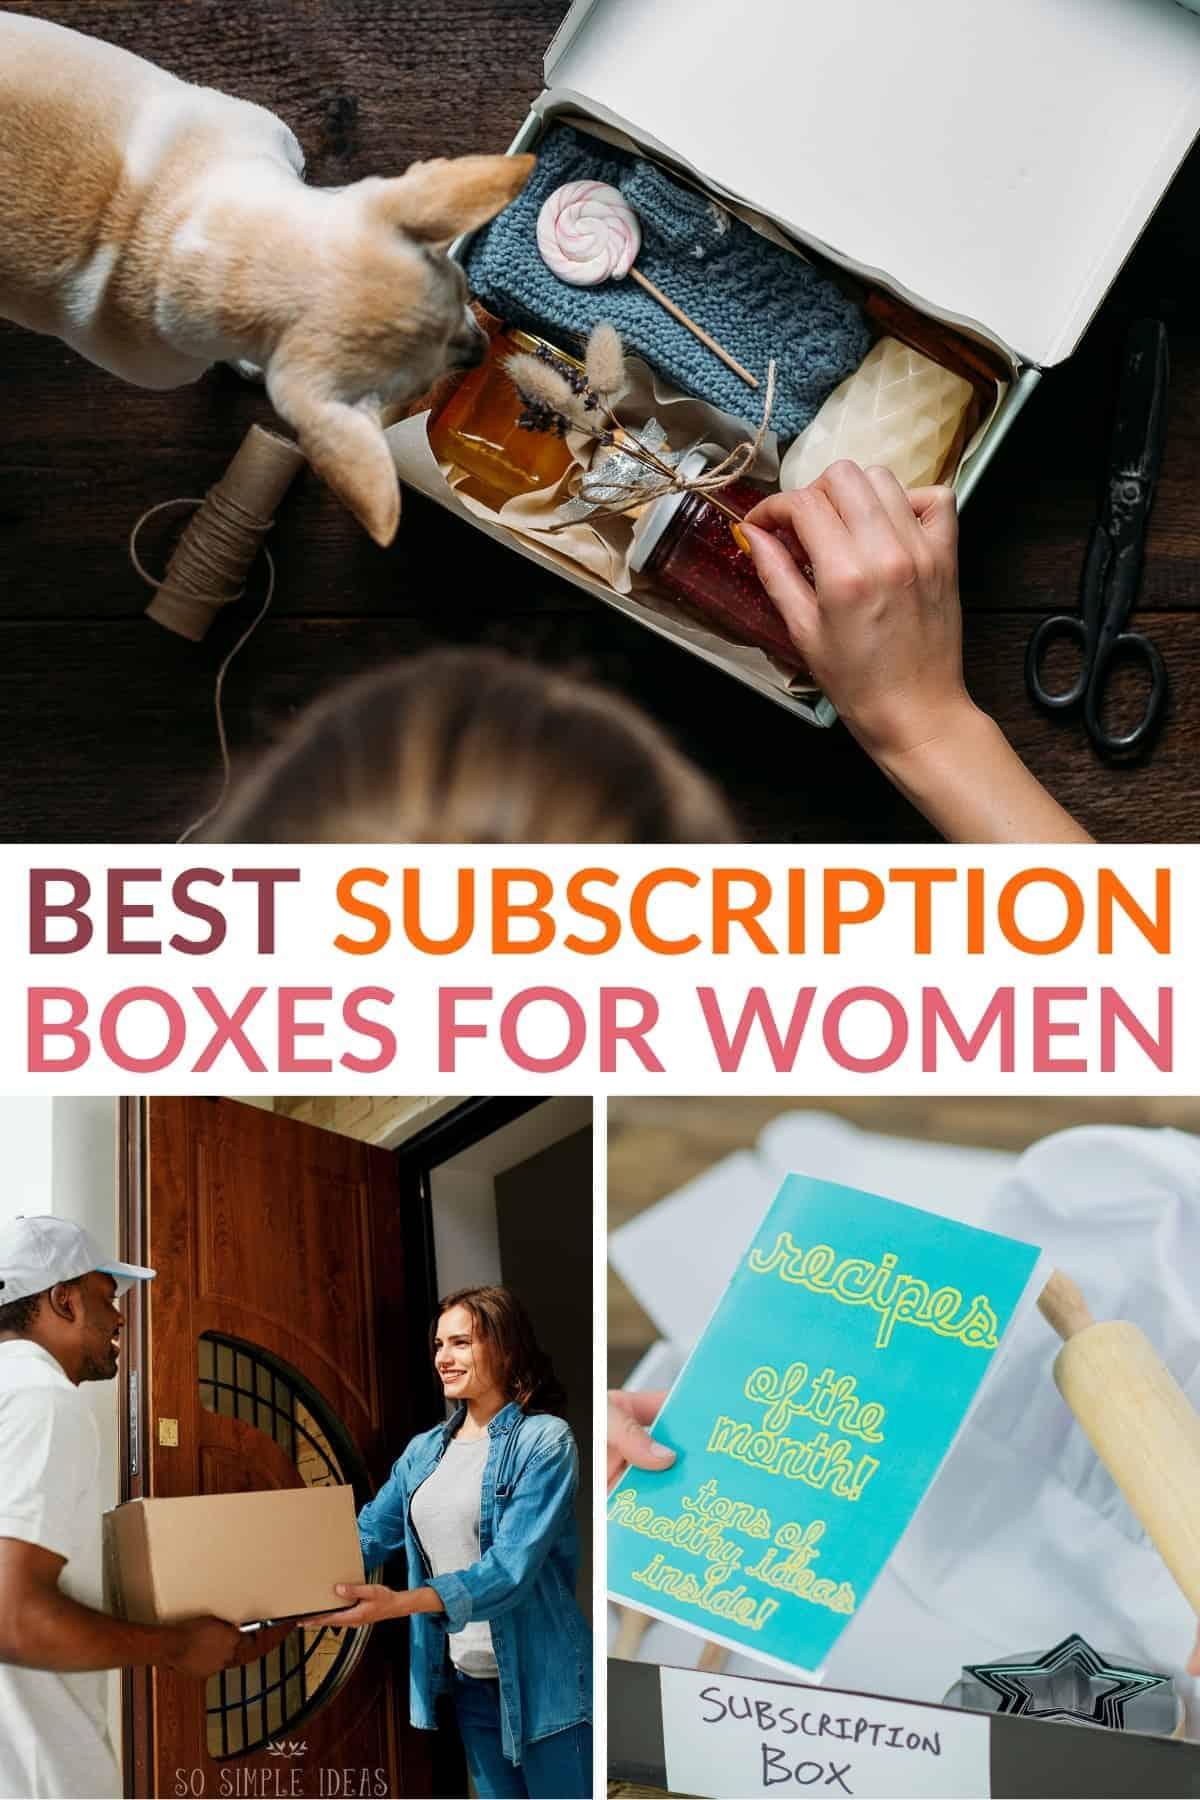 best subscription boxes for women pinterest image